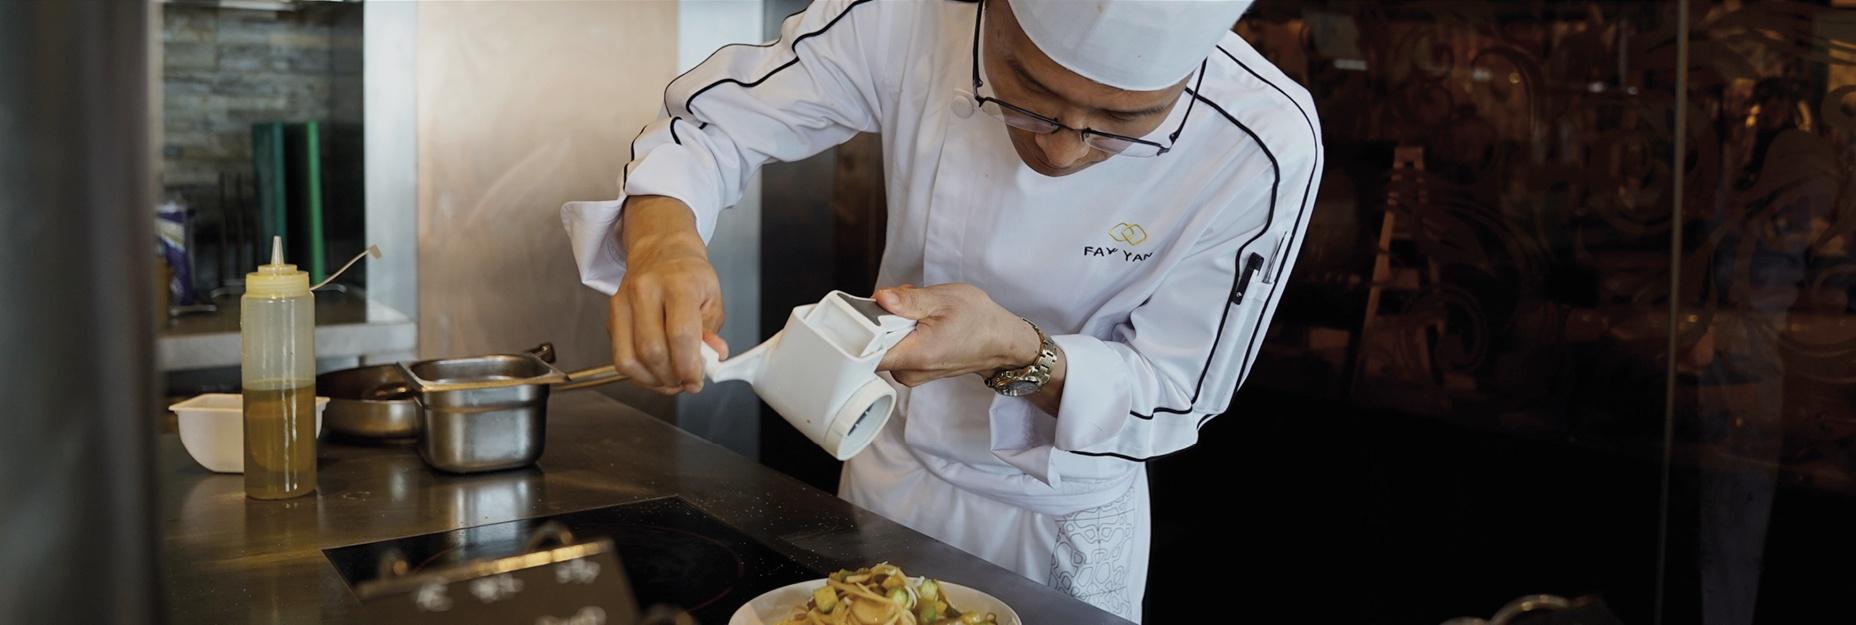 Sofitel kunming cut food waste in half